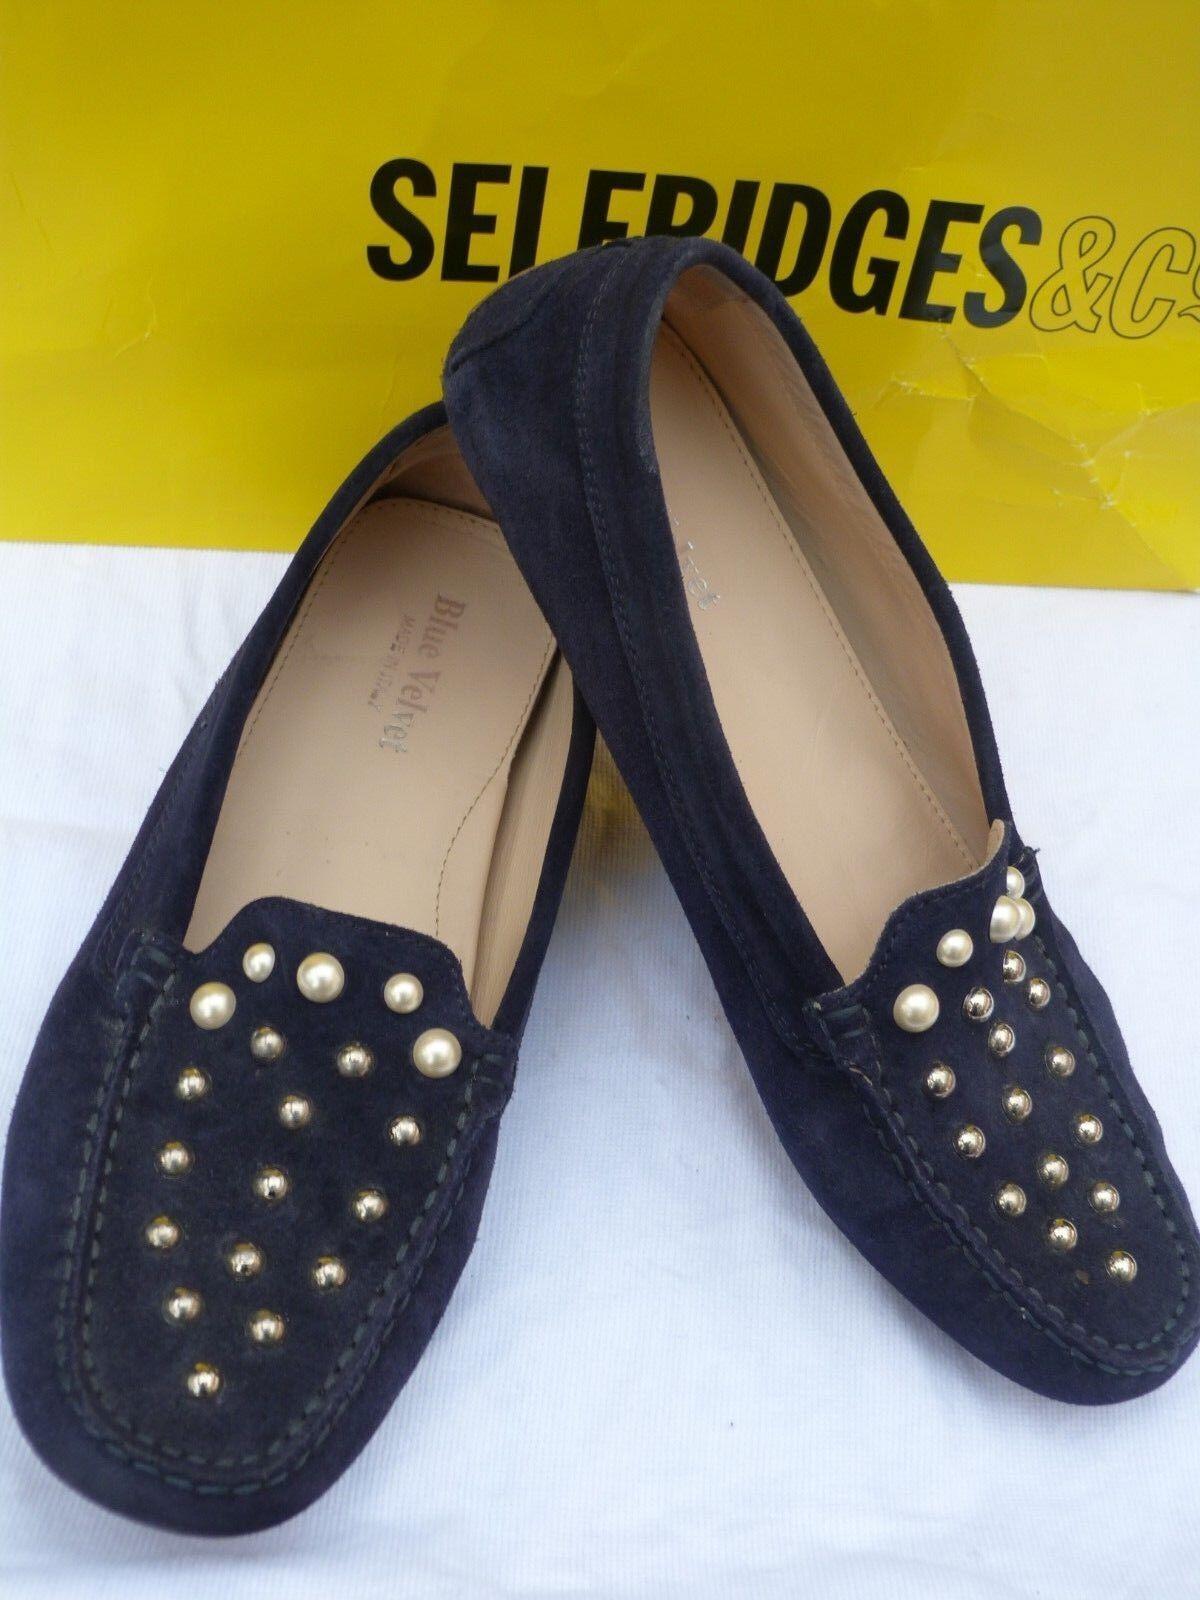 bluee Velvet women's moccasins size 8UK 41 navy sapatos damen sapozky